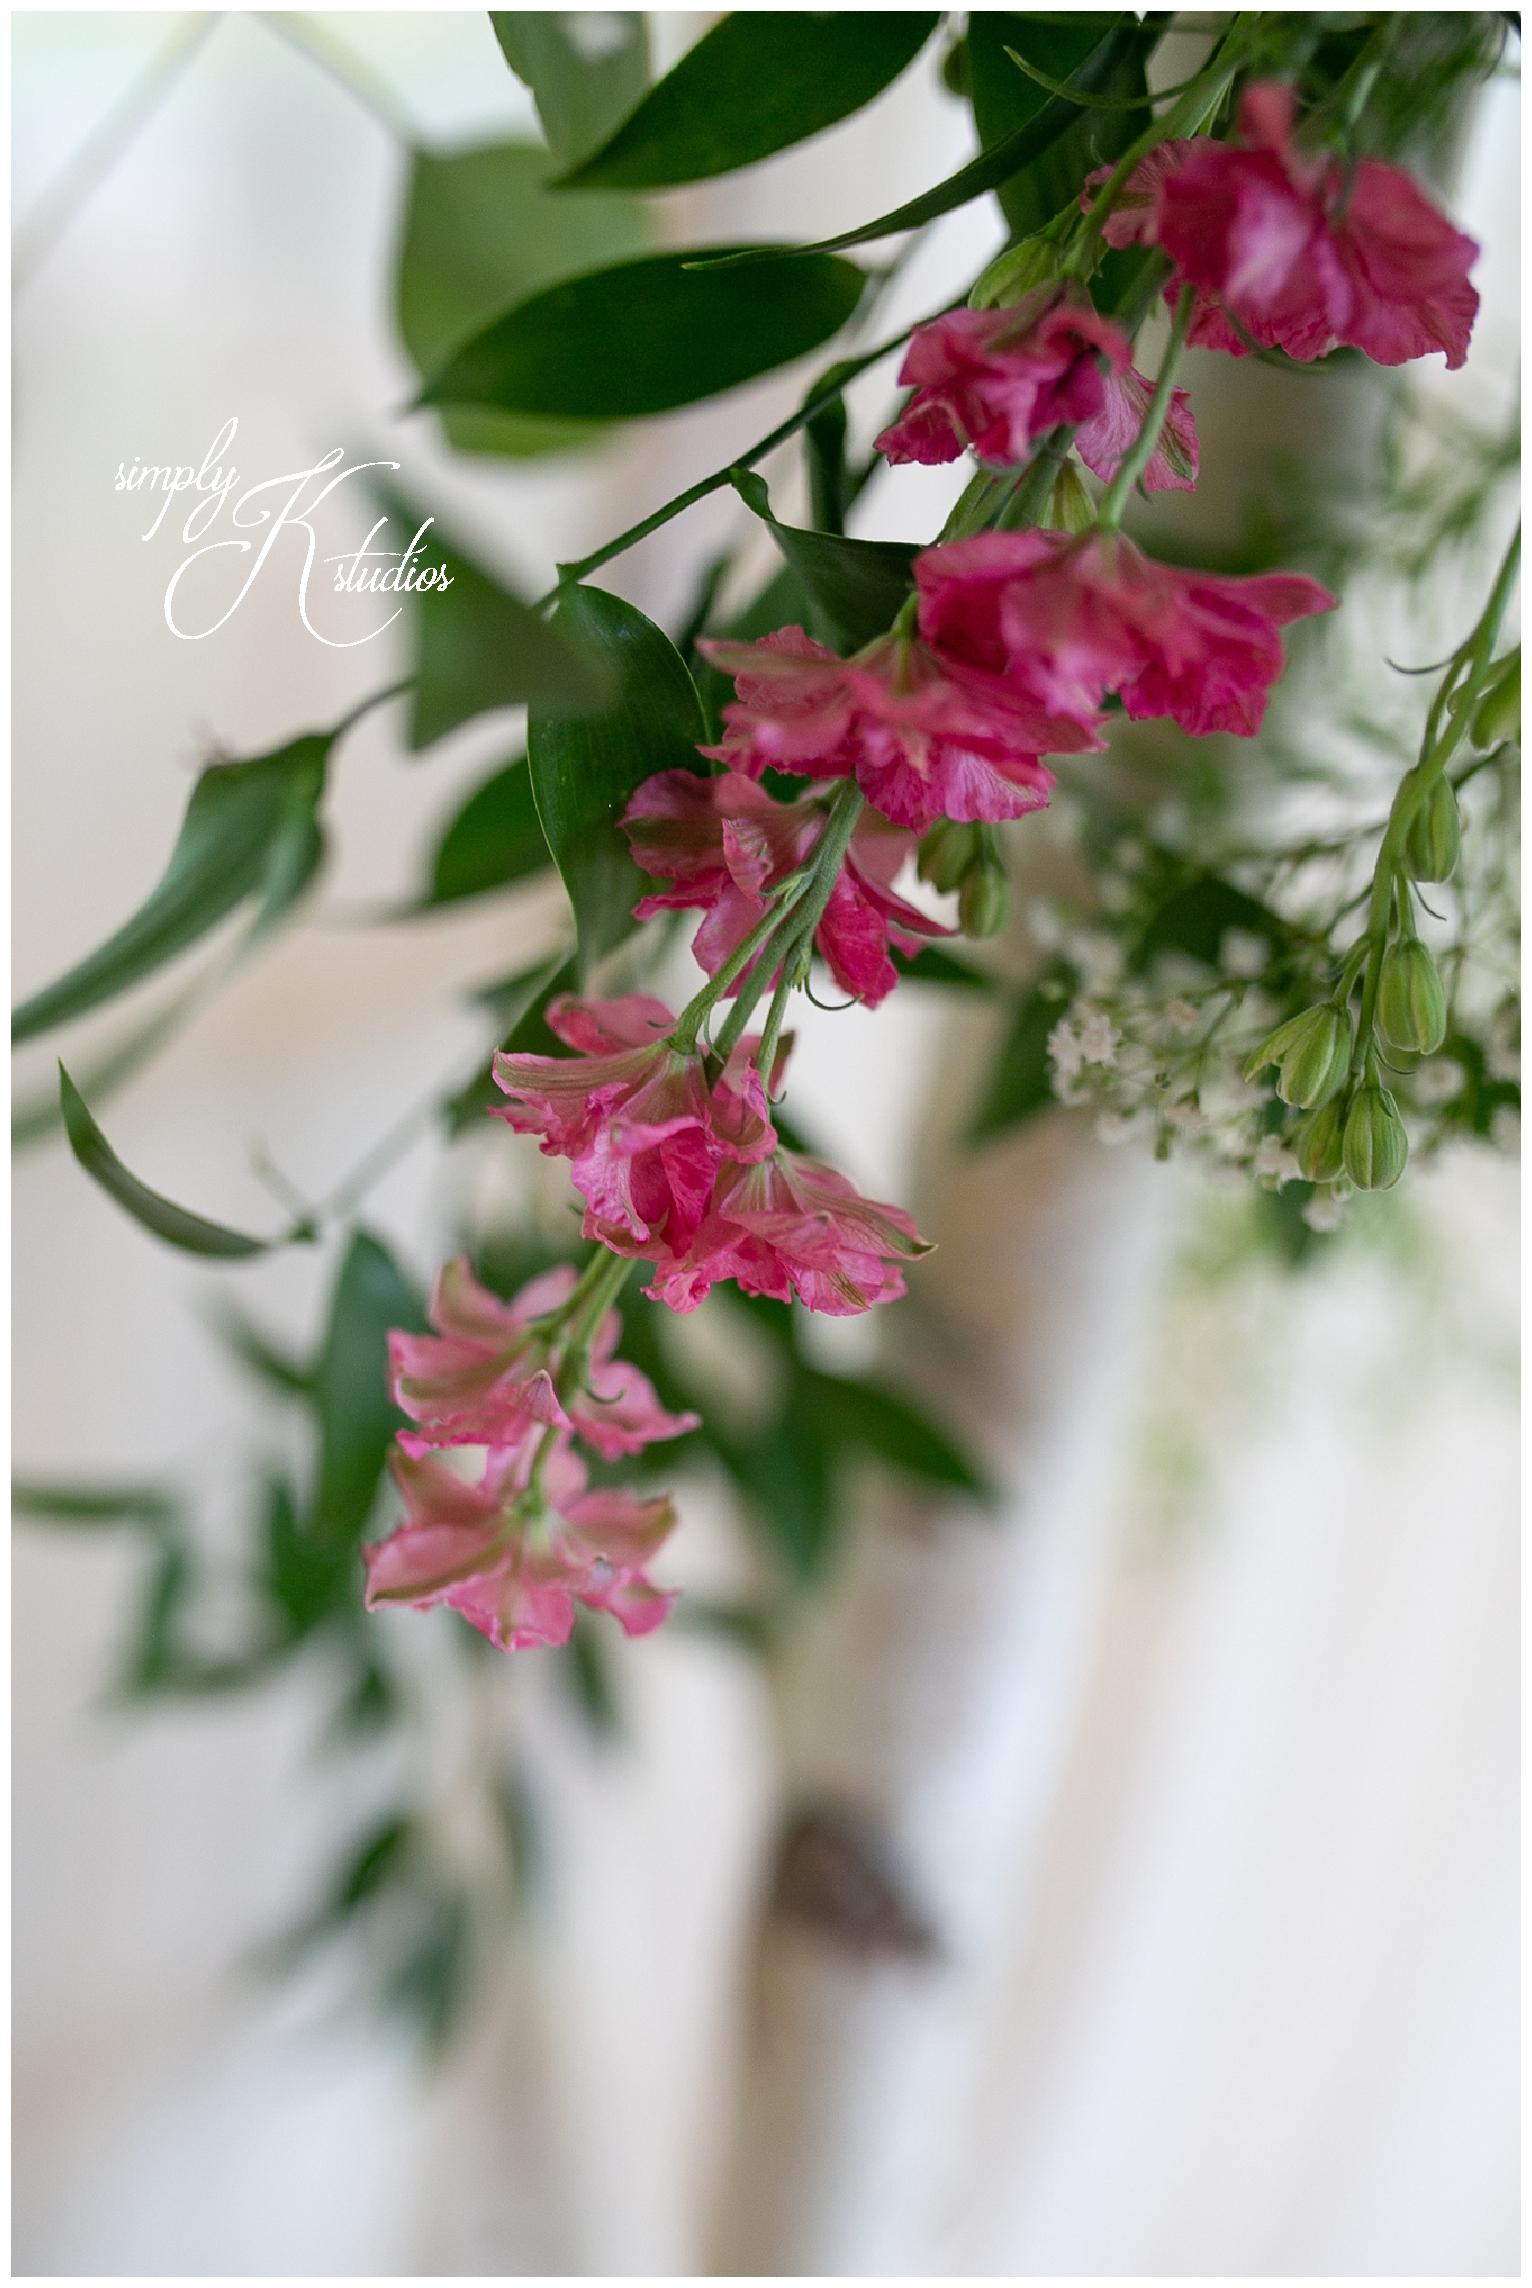 Floral Design by Melissa CT.jpg